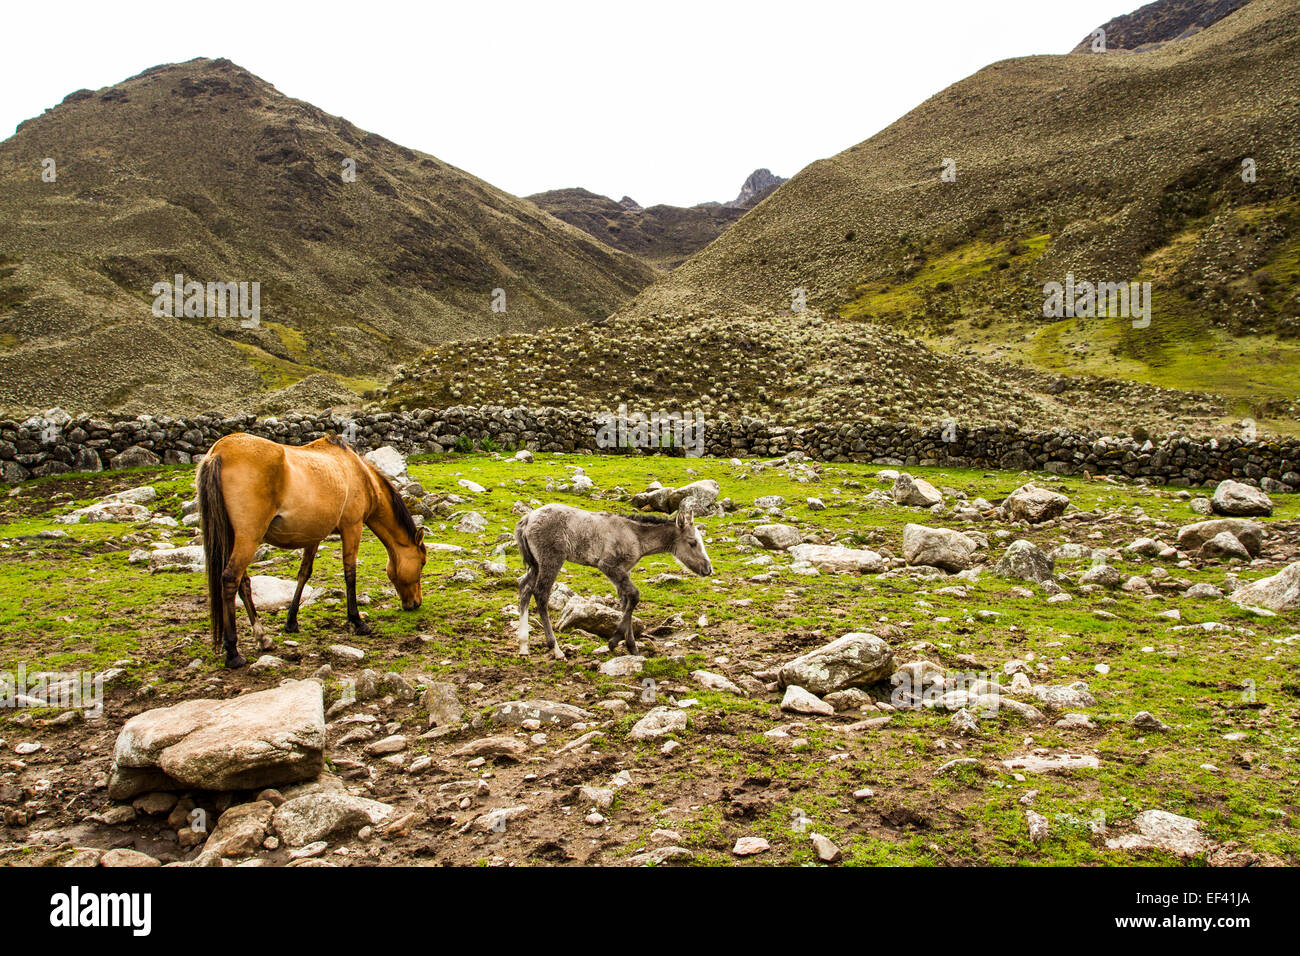 Horses in Sierra de la Culata National Park. Merida, Merida State, Venezuela. - Stock Image